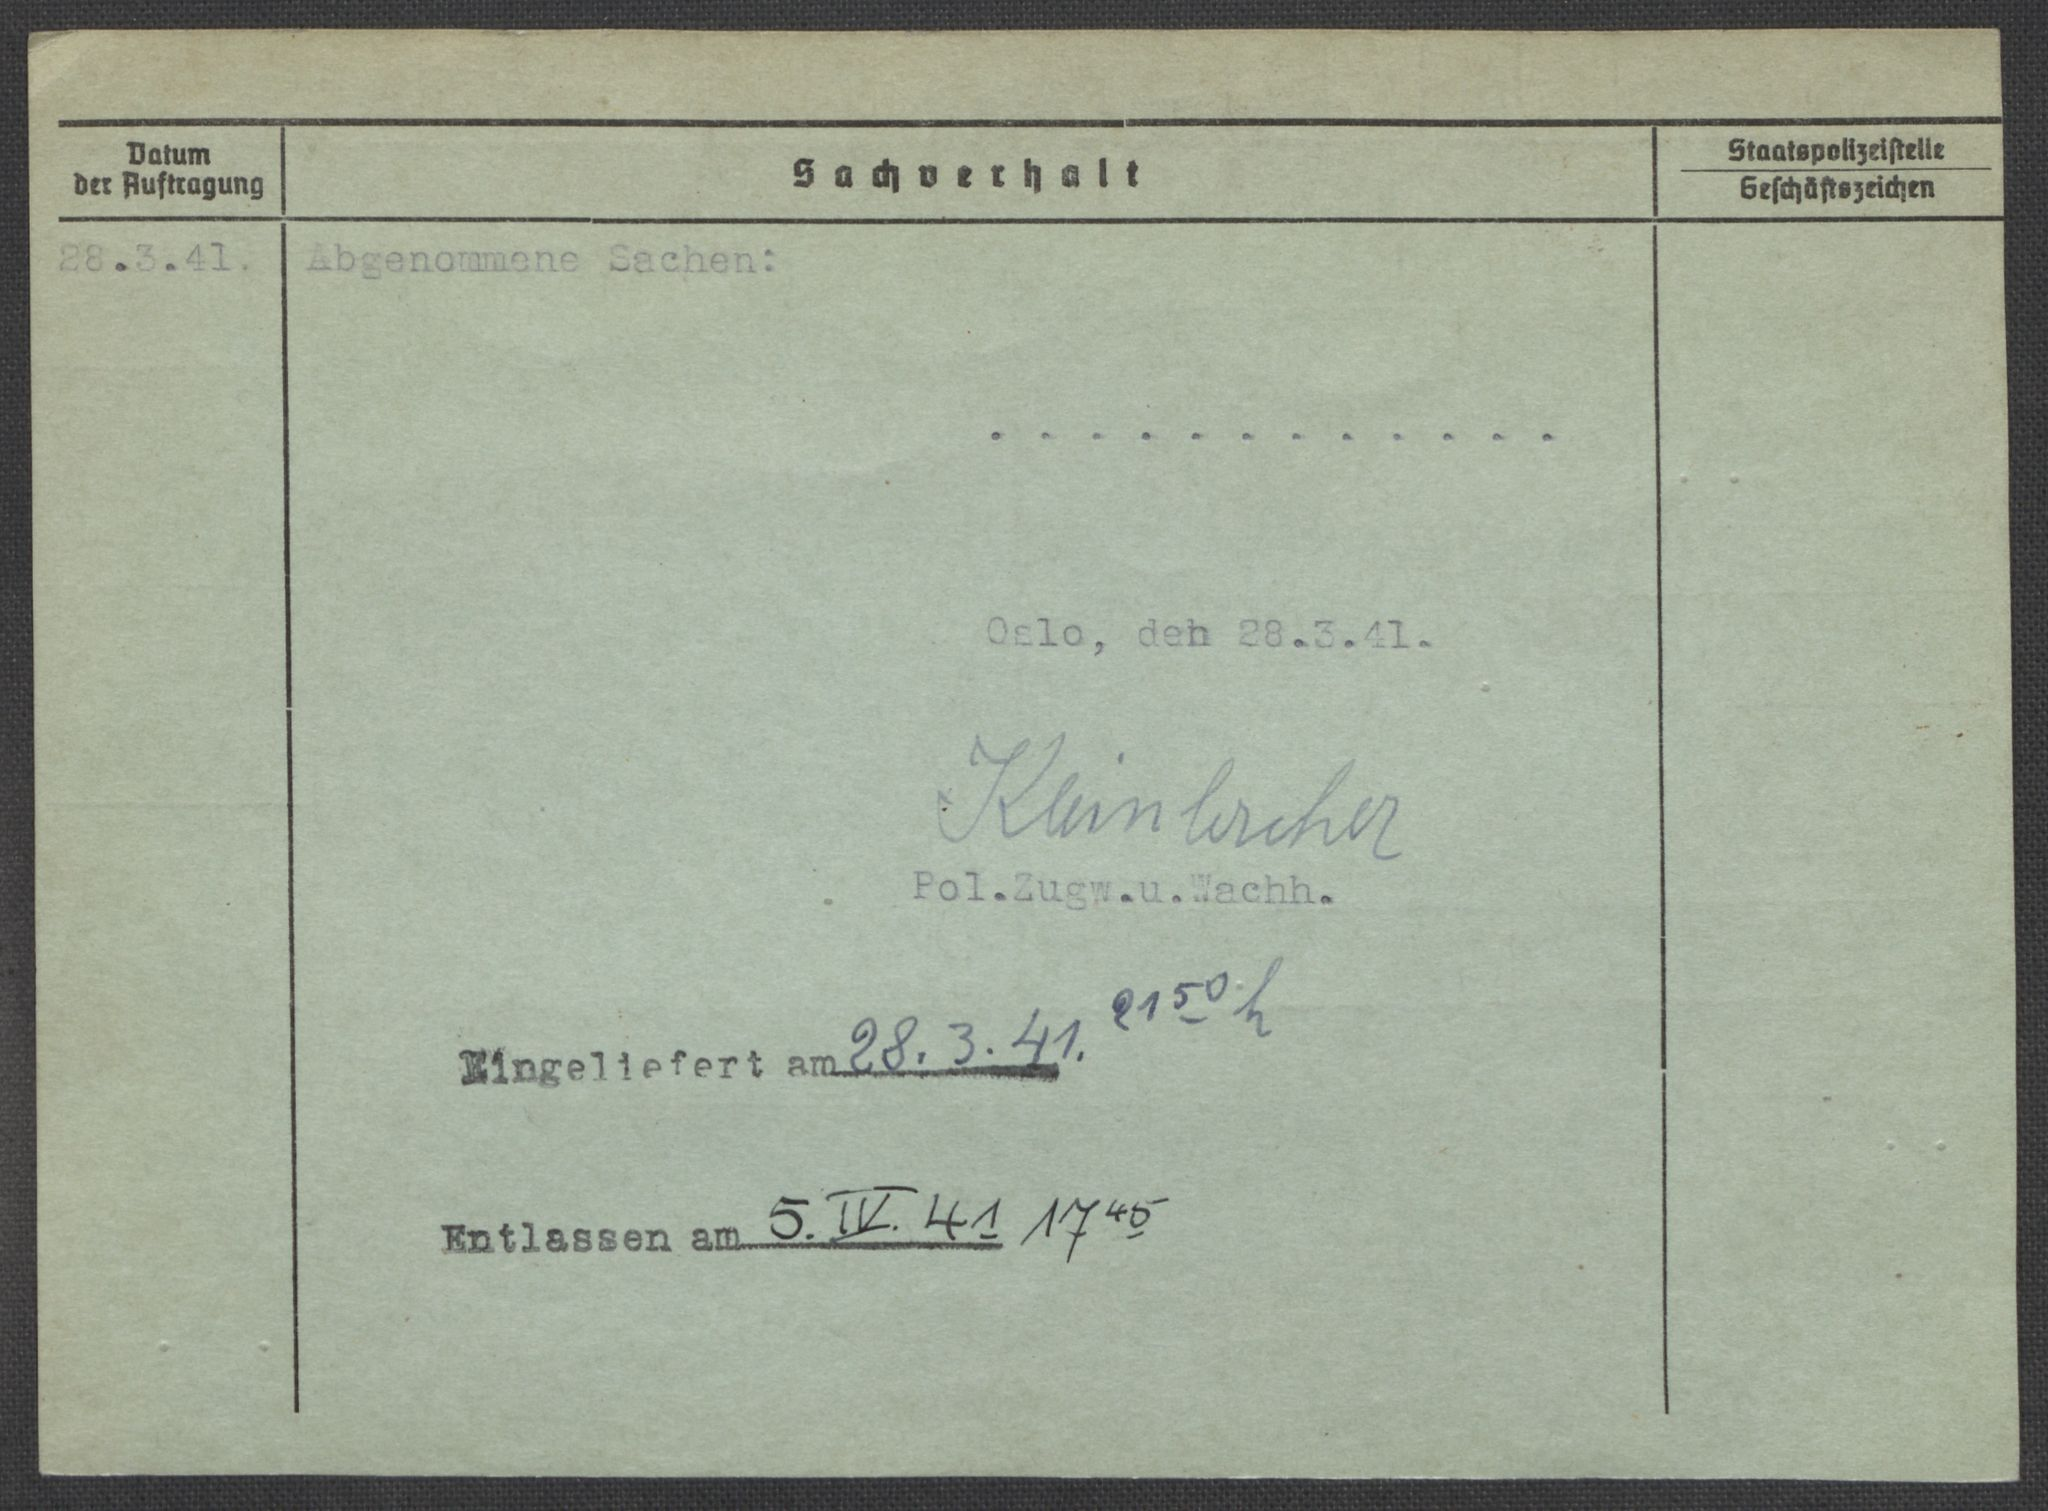 RA, Befehlshaber der Sicherheitspolizei und des SD, E/Ea/Eaa/L0005: Register over norske fanger i Møllergata 19: Hø-Kj, 1940-1945, s. 588